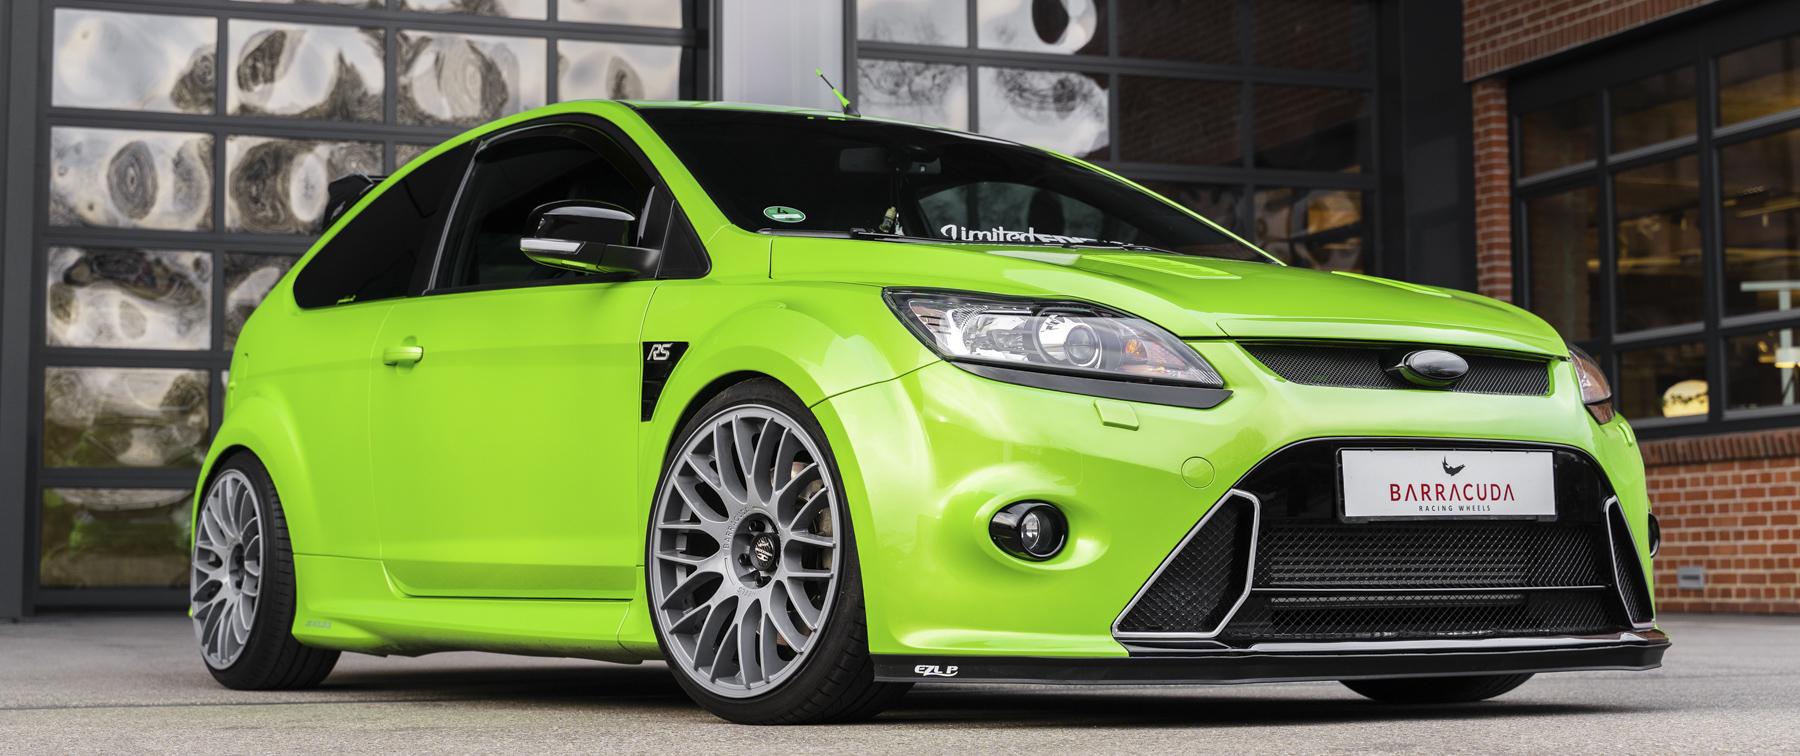 Ford – Focus RS – Grün – BARRACUDA – Karizzma – Grau – 19 Zoll